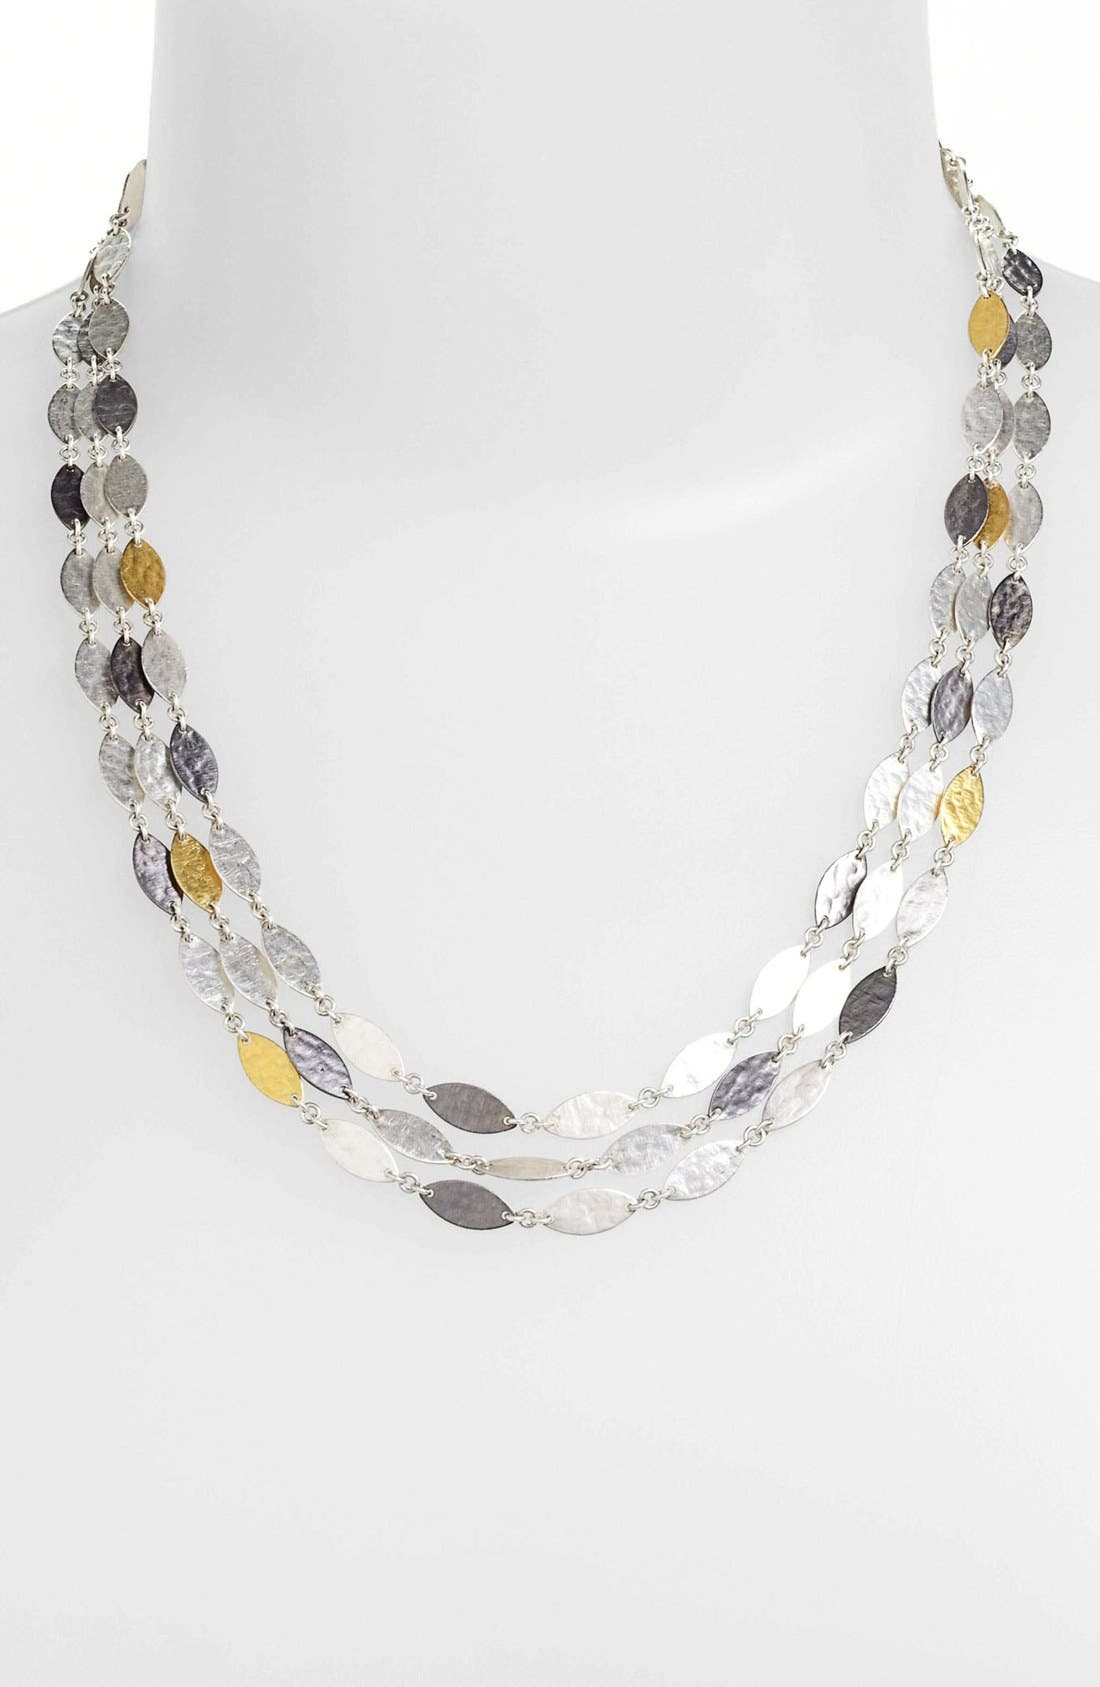 Alternate Image 1 Selected - Gurhan 'Willow' Silver & Gold Leaf Necklace